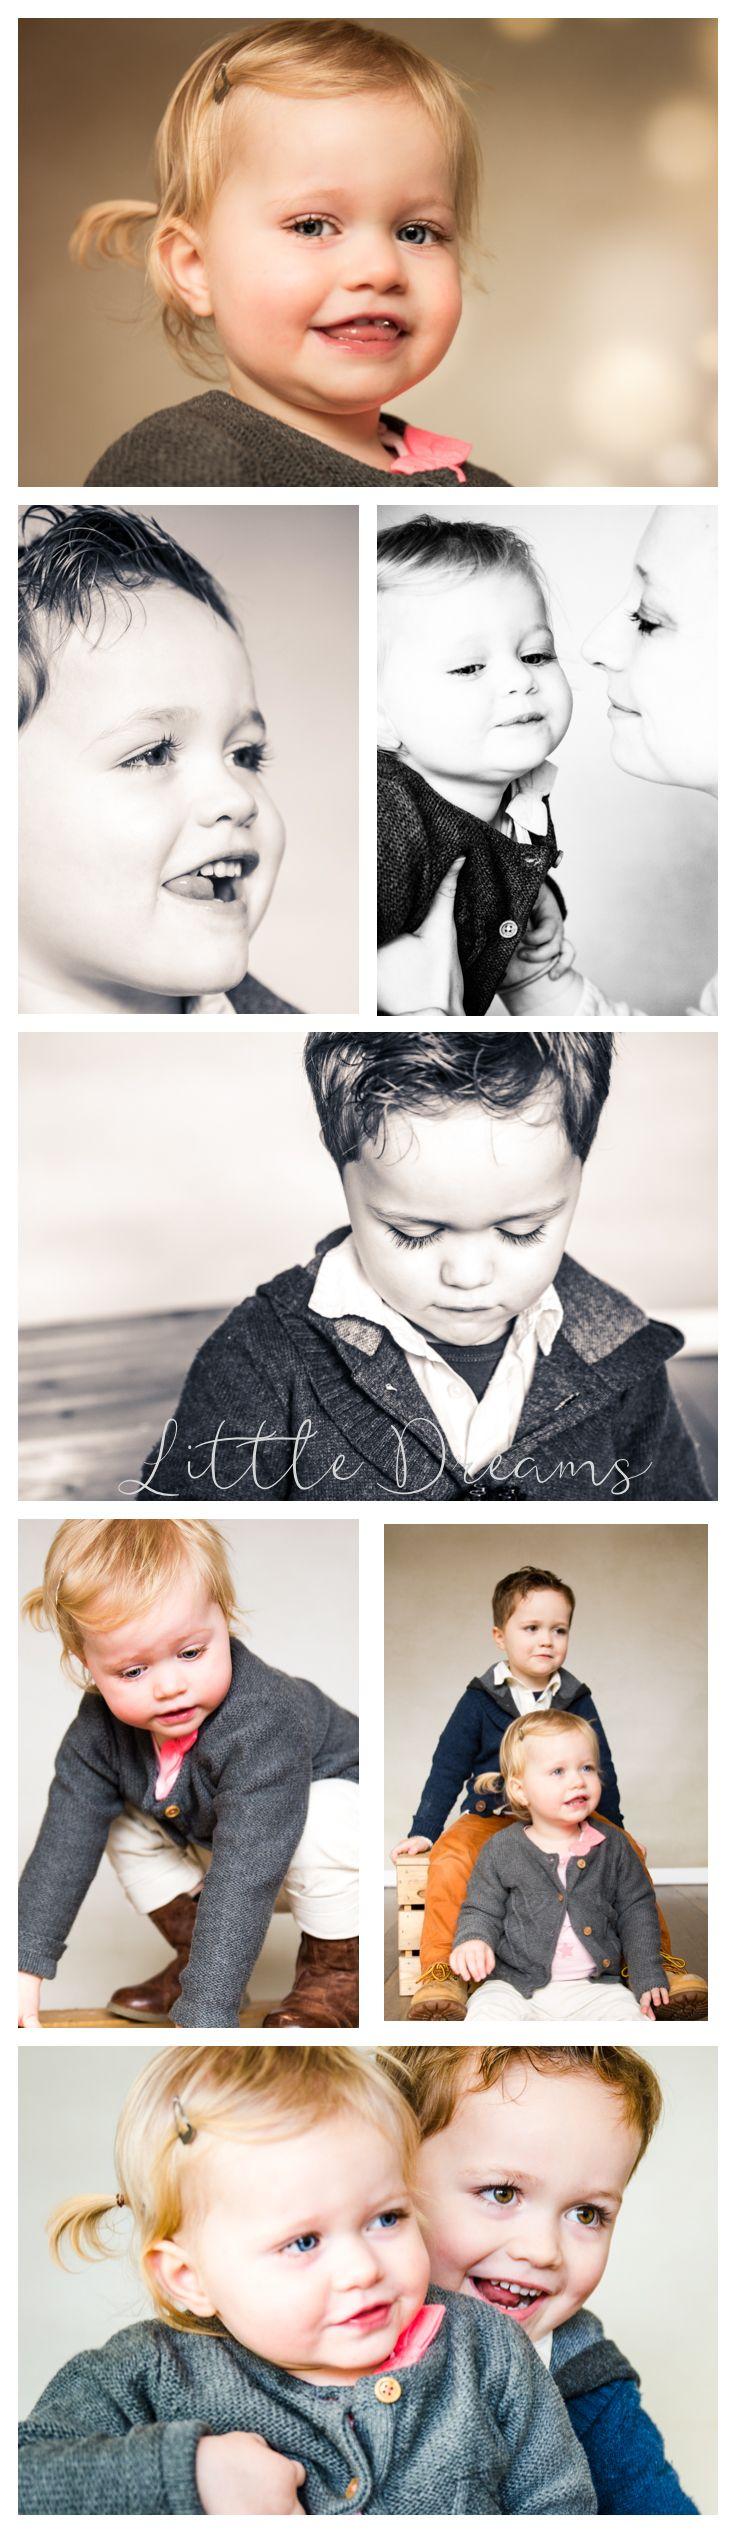 #Broer en zus #fotografie #studio #little dreams #ogen #clean edit